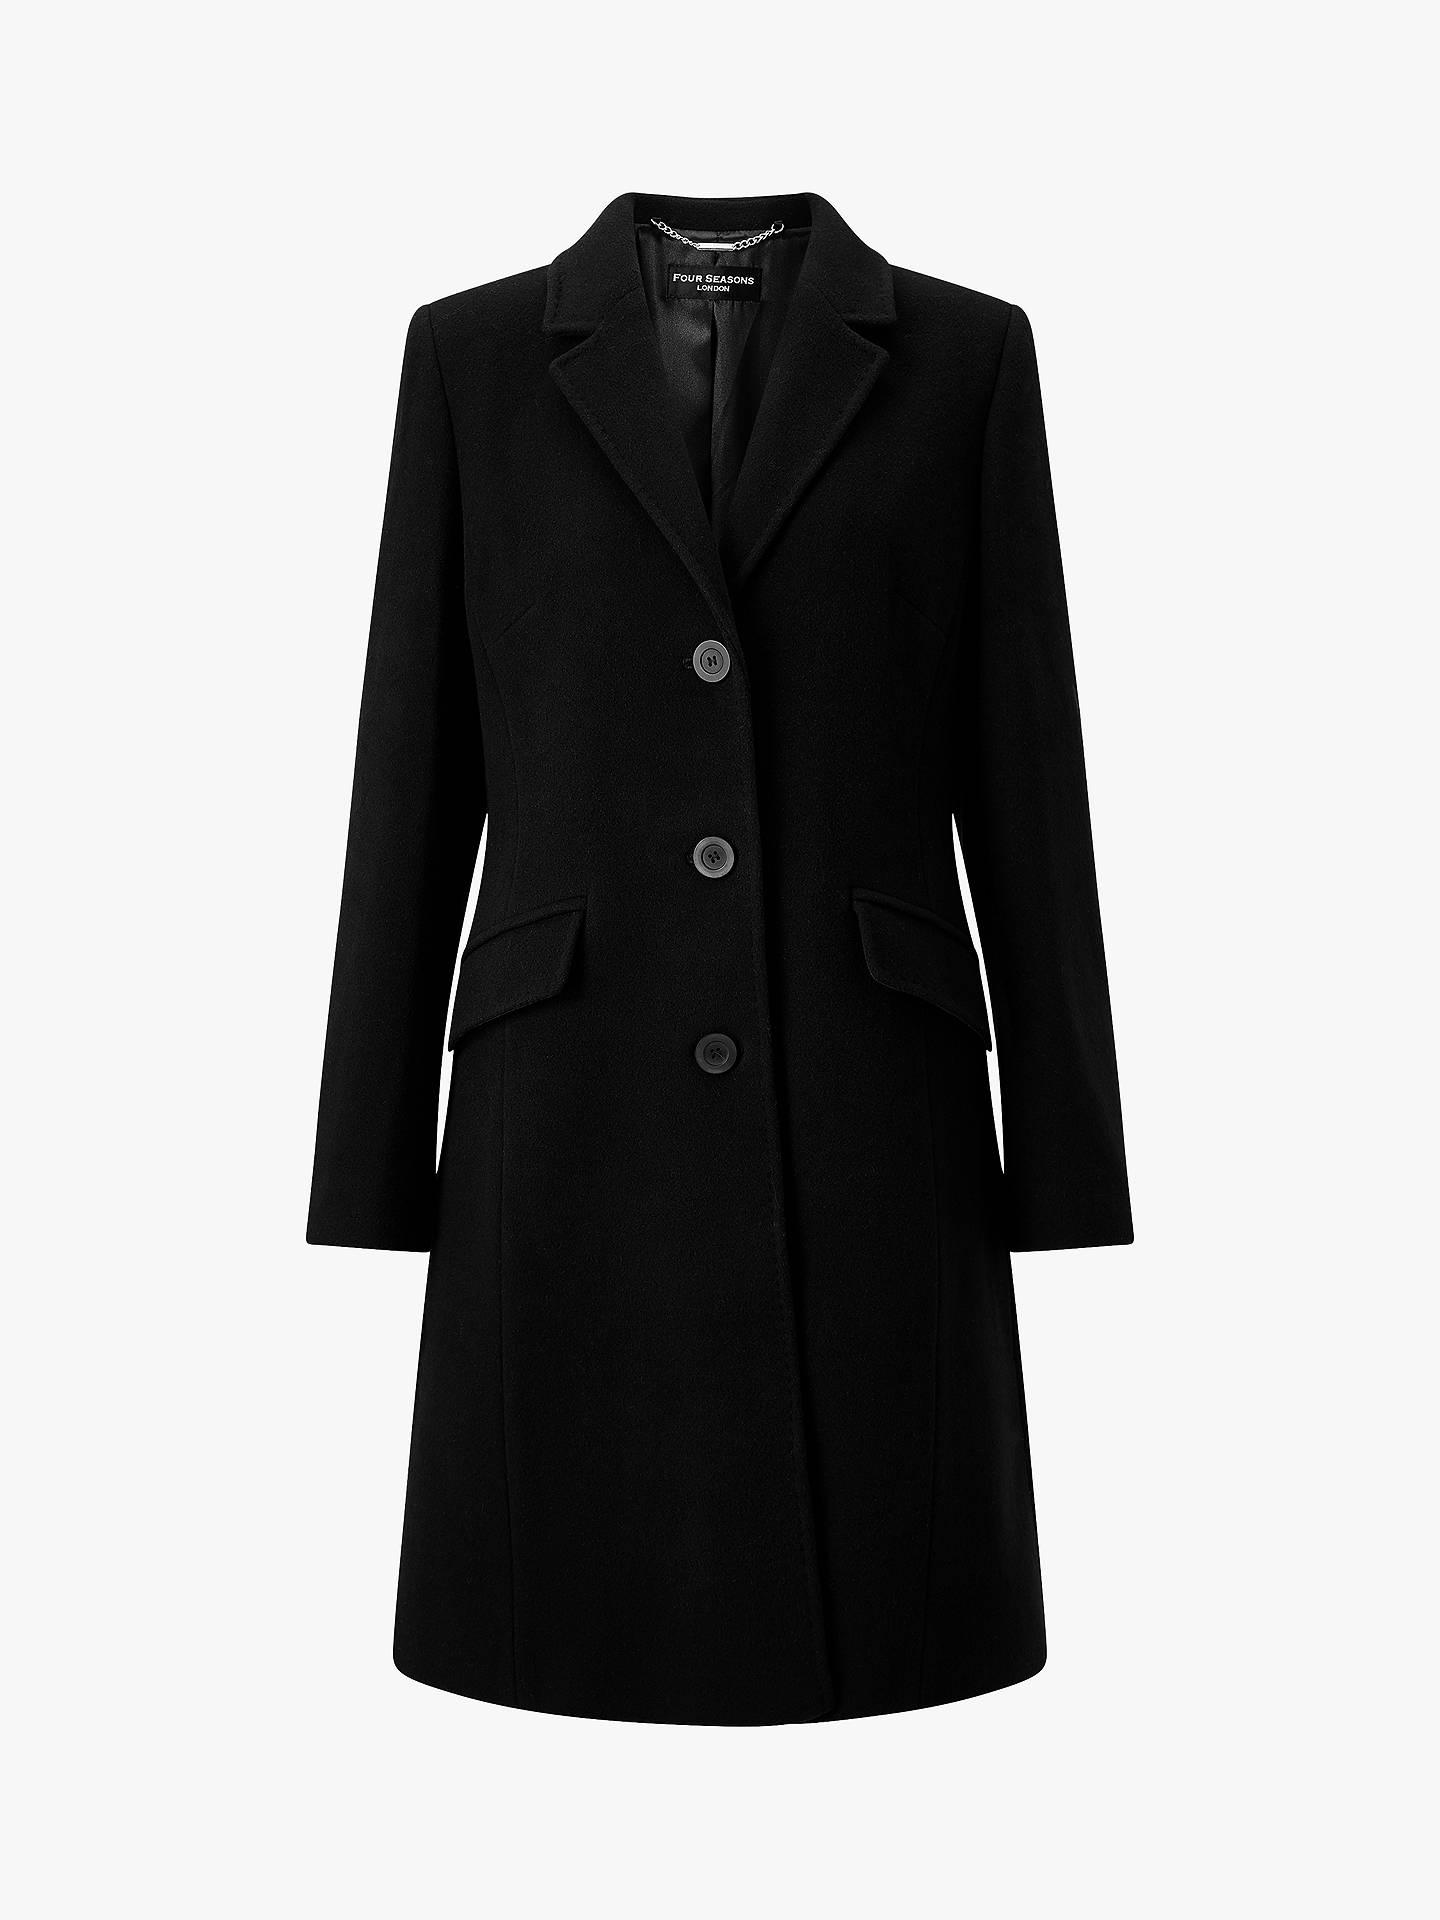 67480f74b91 Four Seasons Slimline 3-Button City Coat, Black at John Lewis & Partners